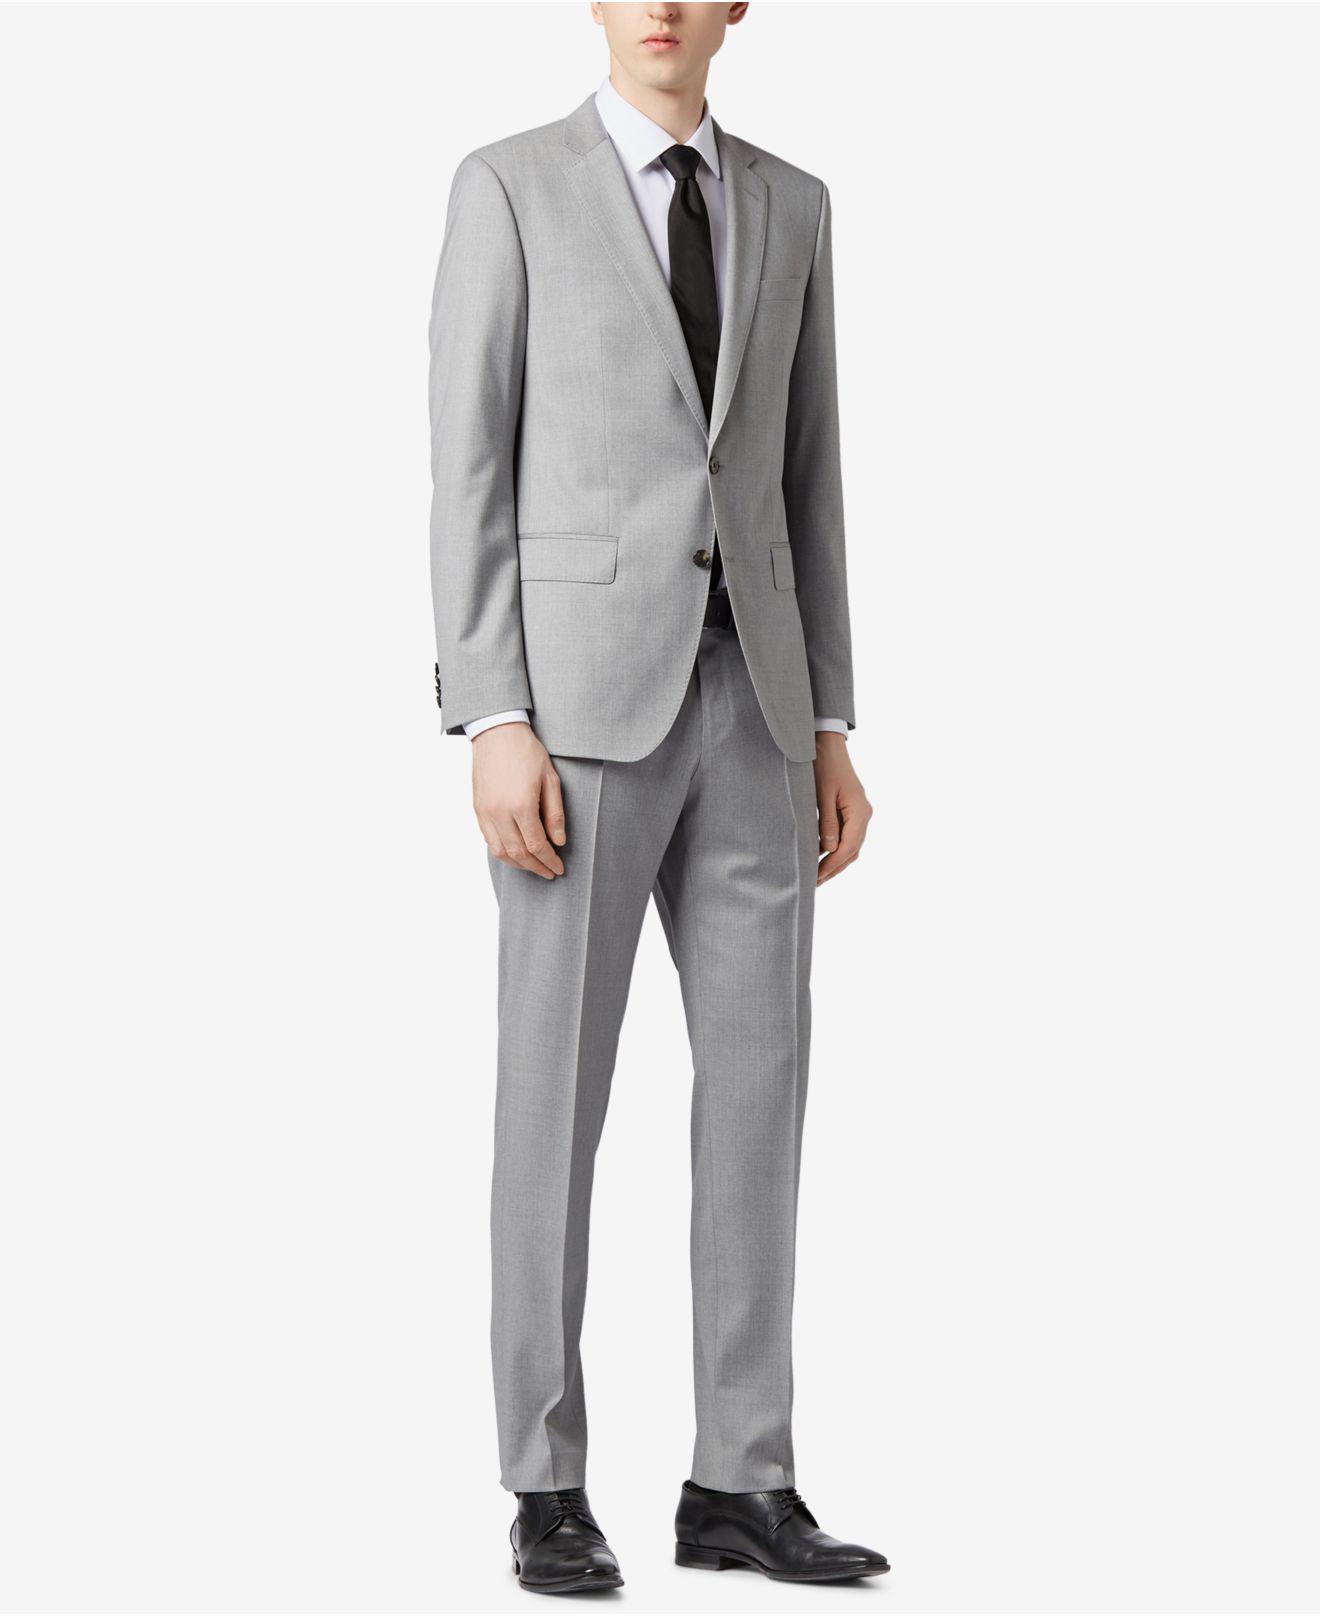 e324e1113 BOSS - Gray Slim-fit Natural Stretch Virgin Wool Suit for Men - Lyst. View  fullscreen